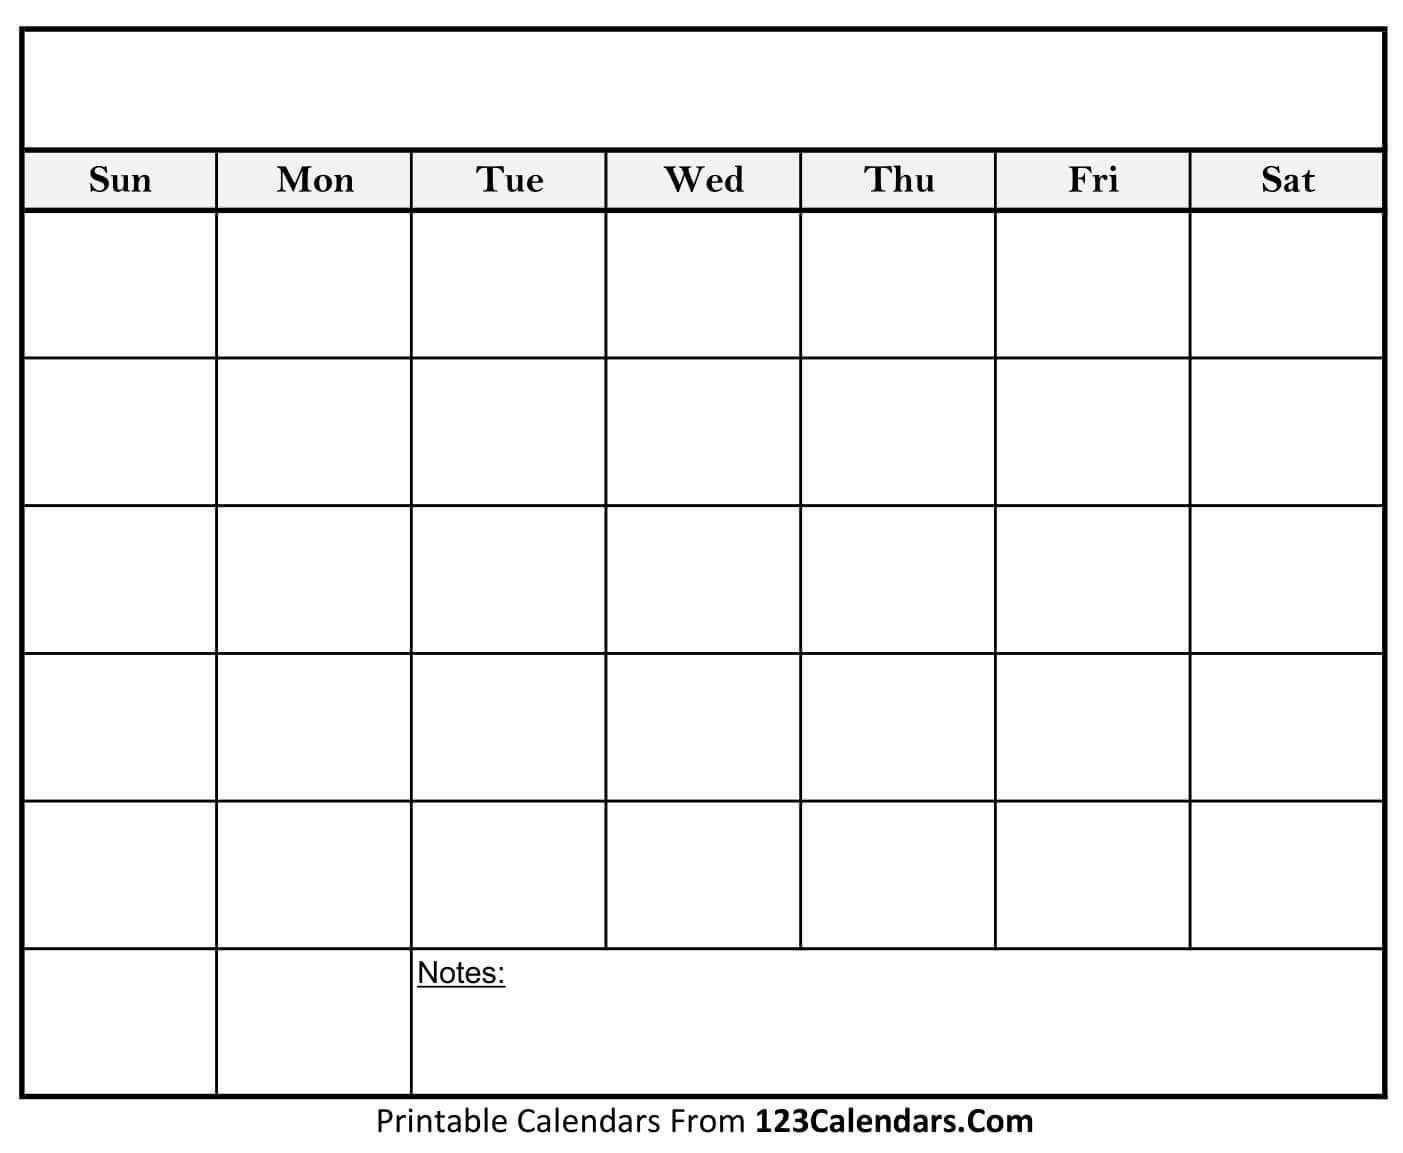 Free Printable Blank Calendar | 123Calendars throughout Blank Calendar Template With Notes